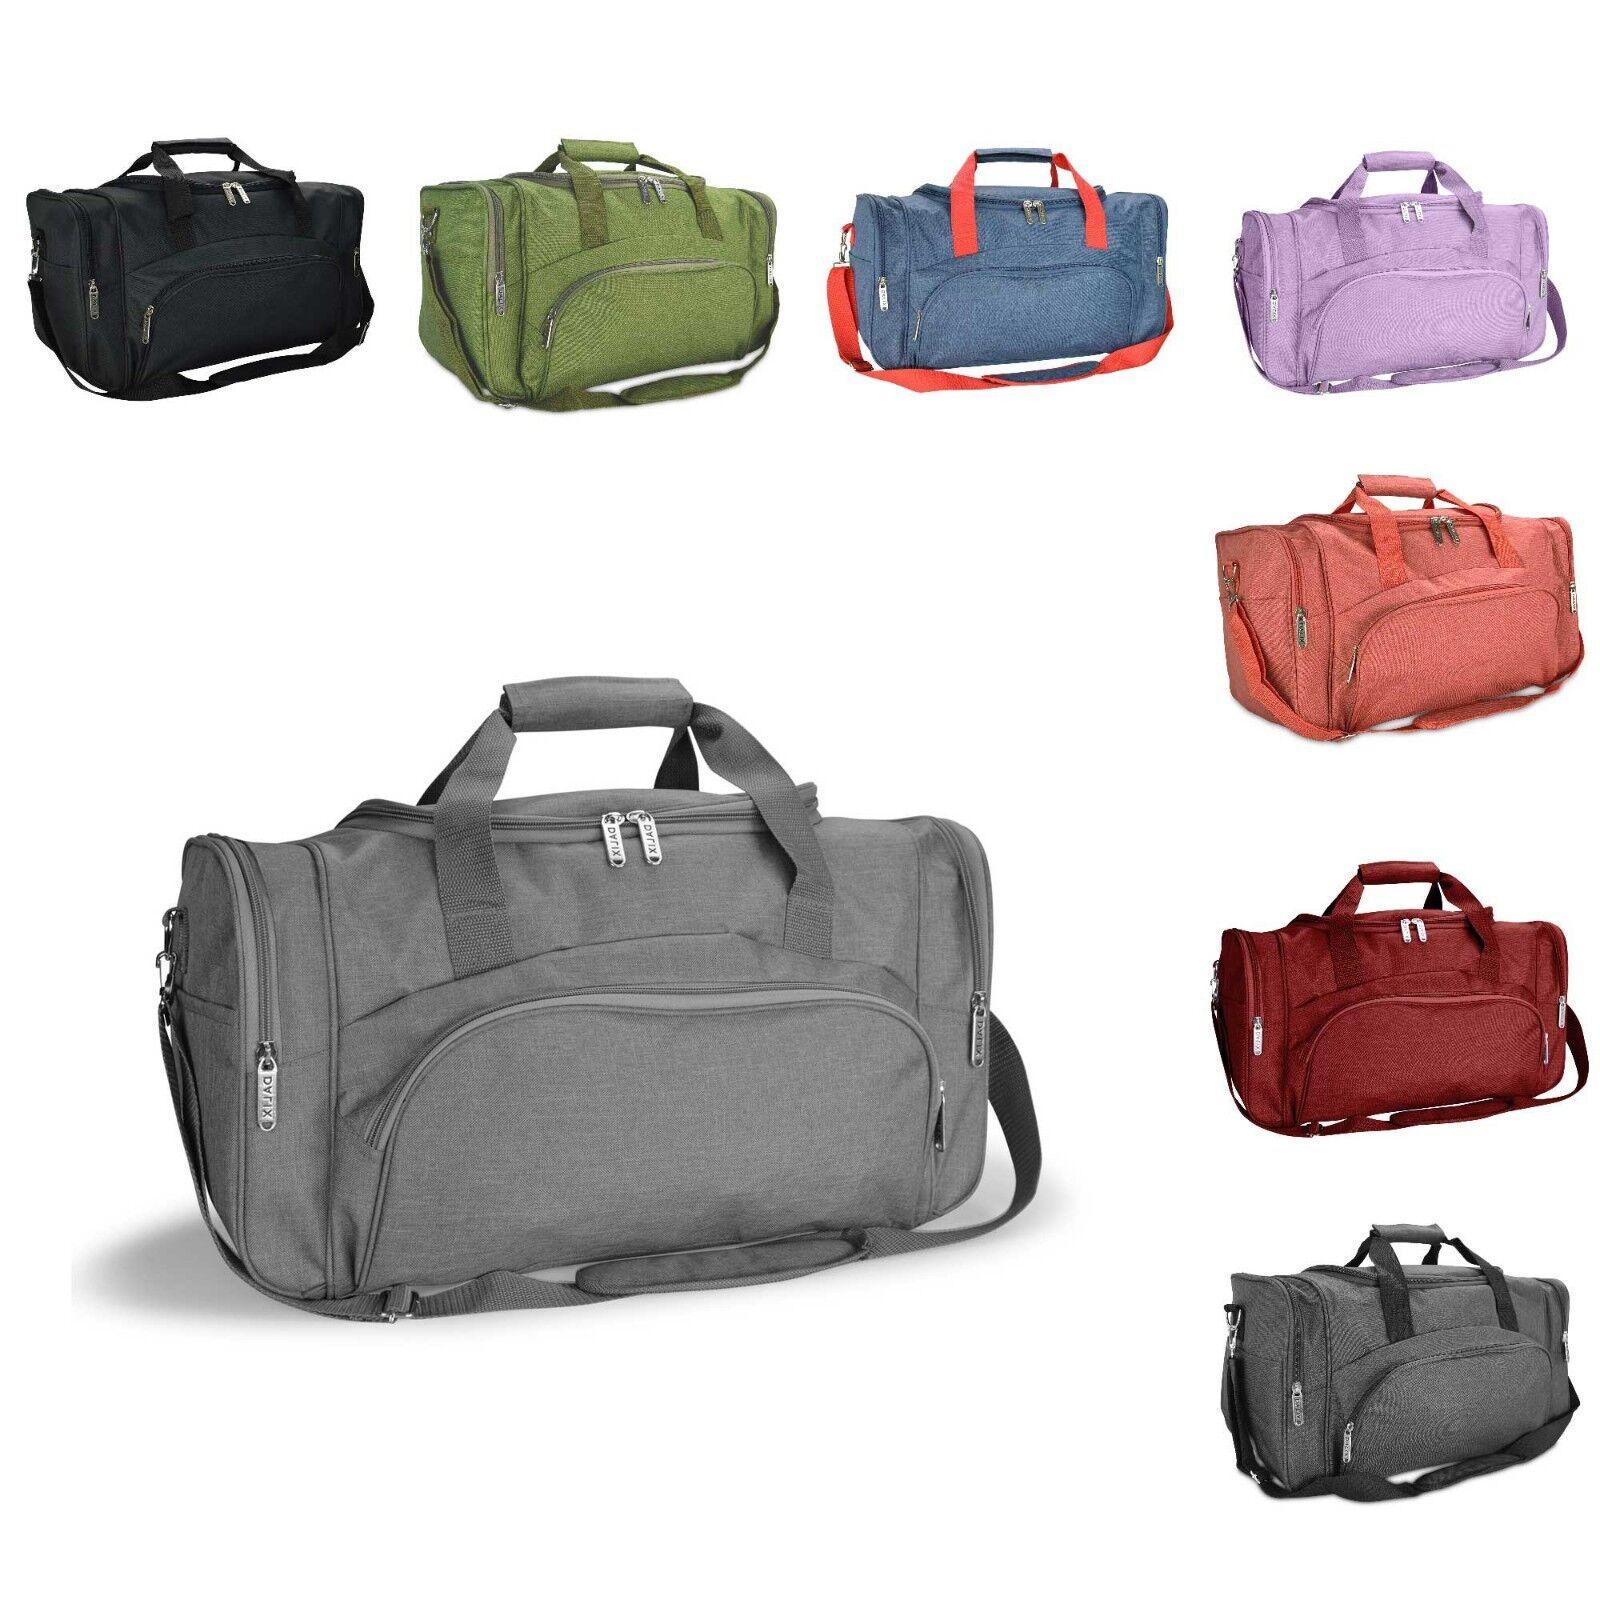 DALIX Signature Travel or Gym Duffle Bag